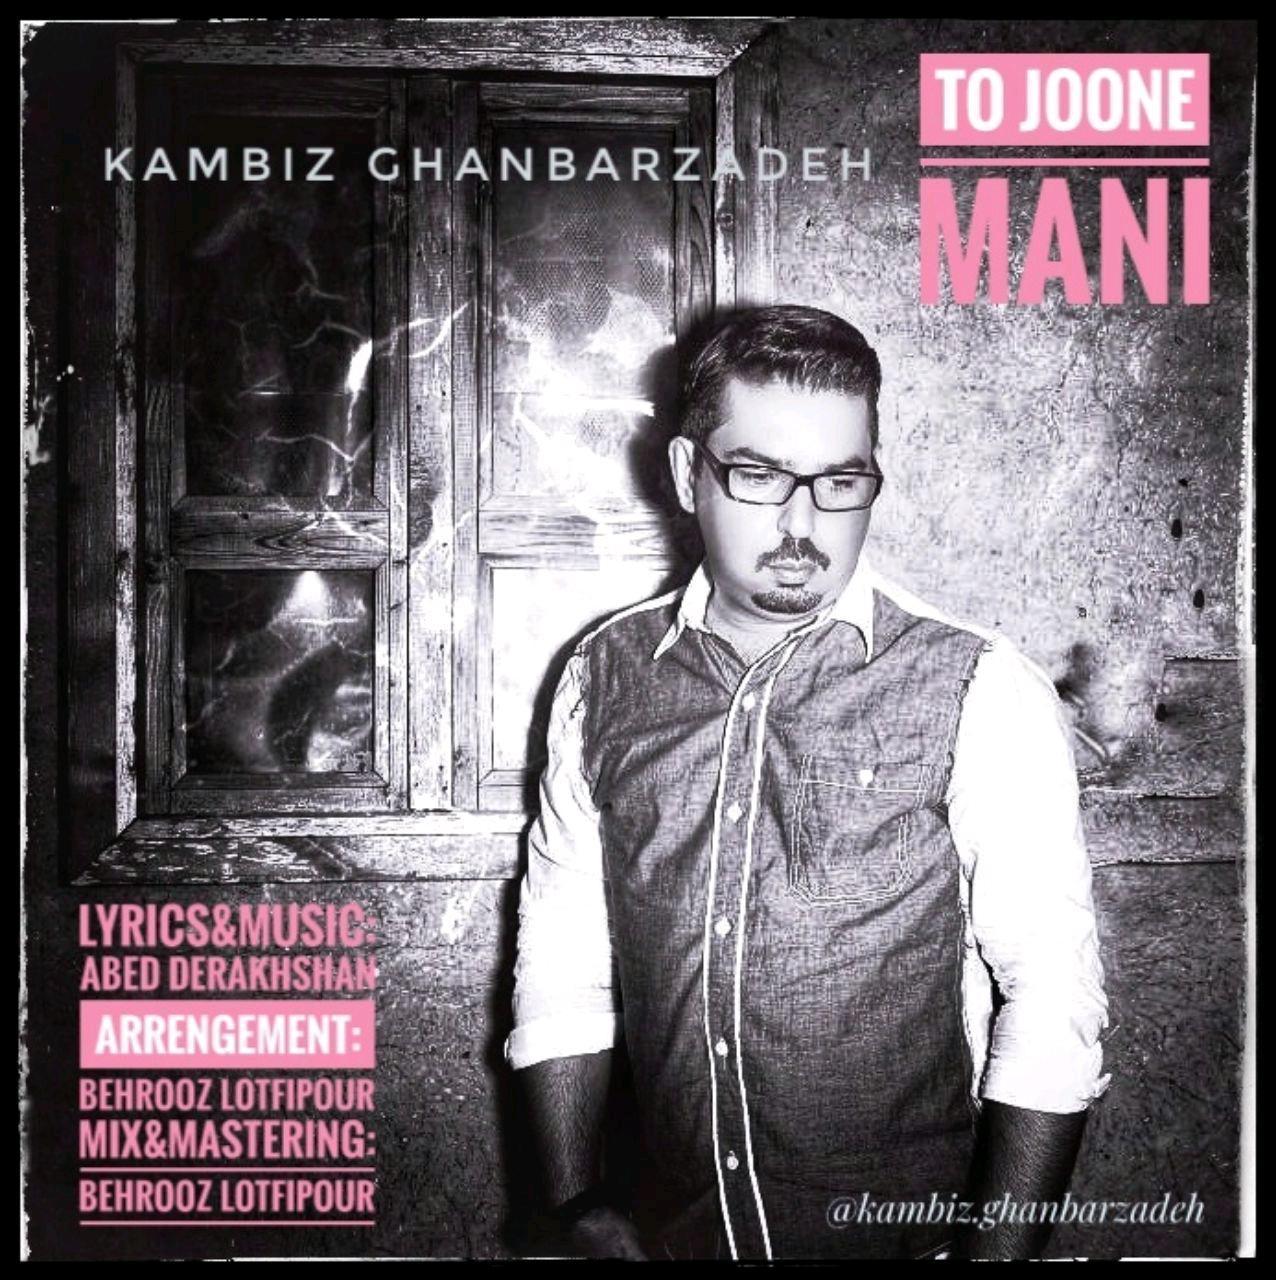 Kambiz Ghanbarzadeh – To Joone Mani